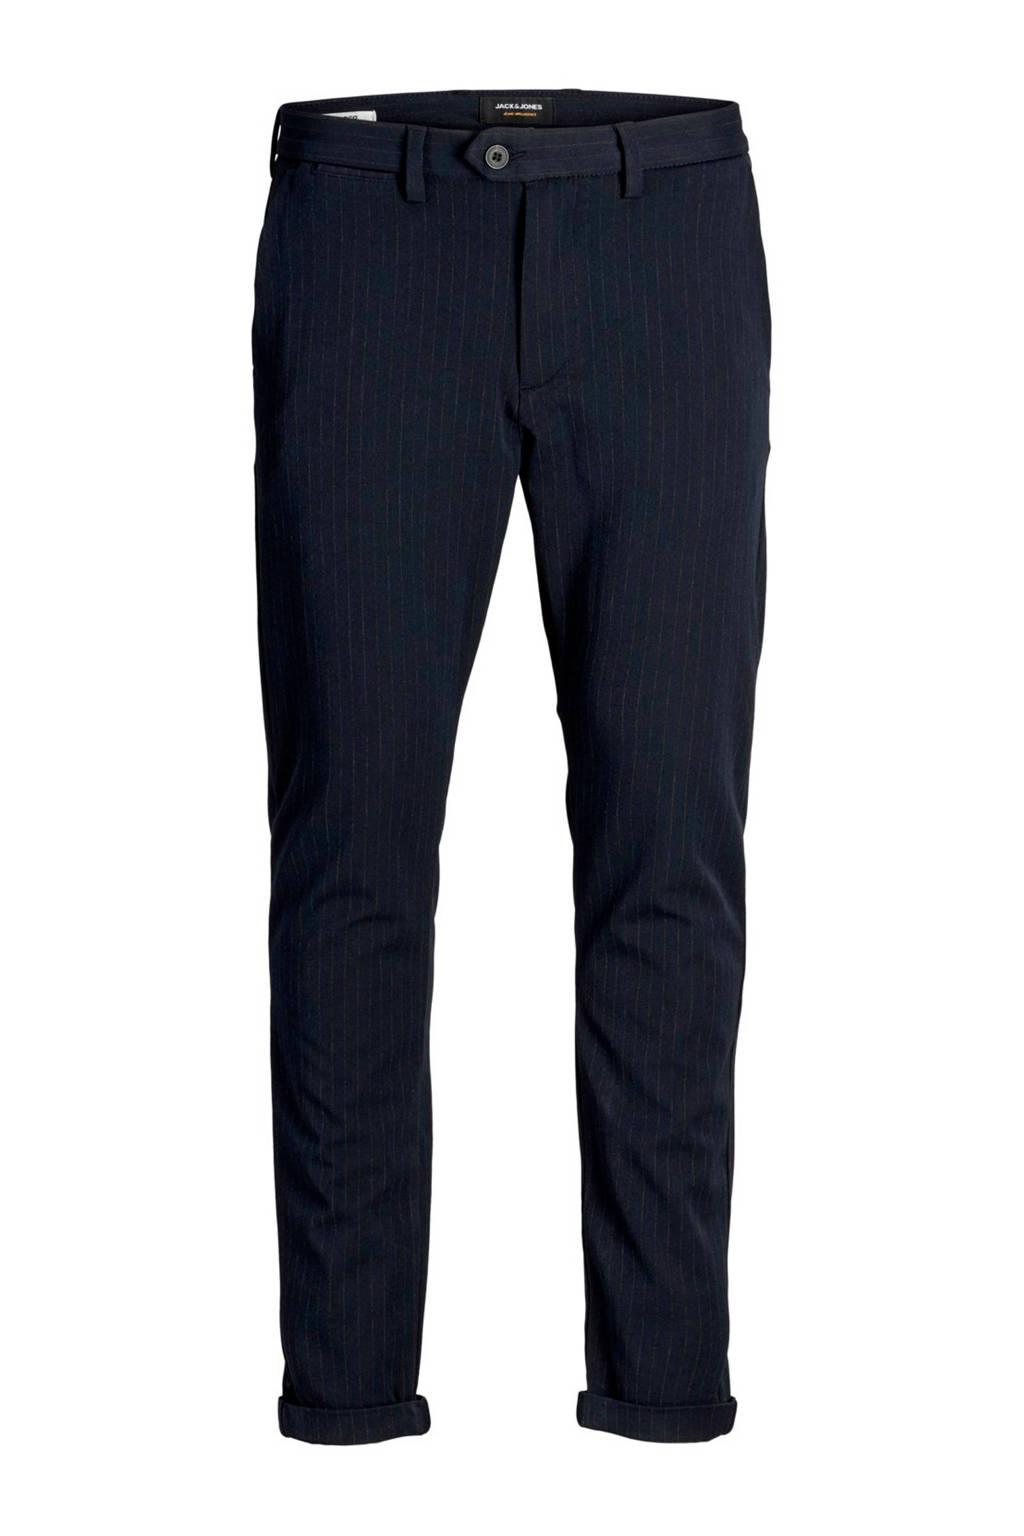 JACK & JONES slim fit pantalon Marco met krijtstreep marine/ecru, Marine/ecru